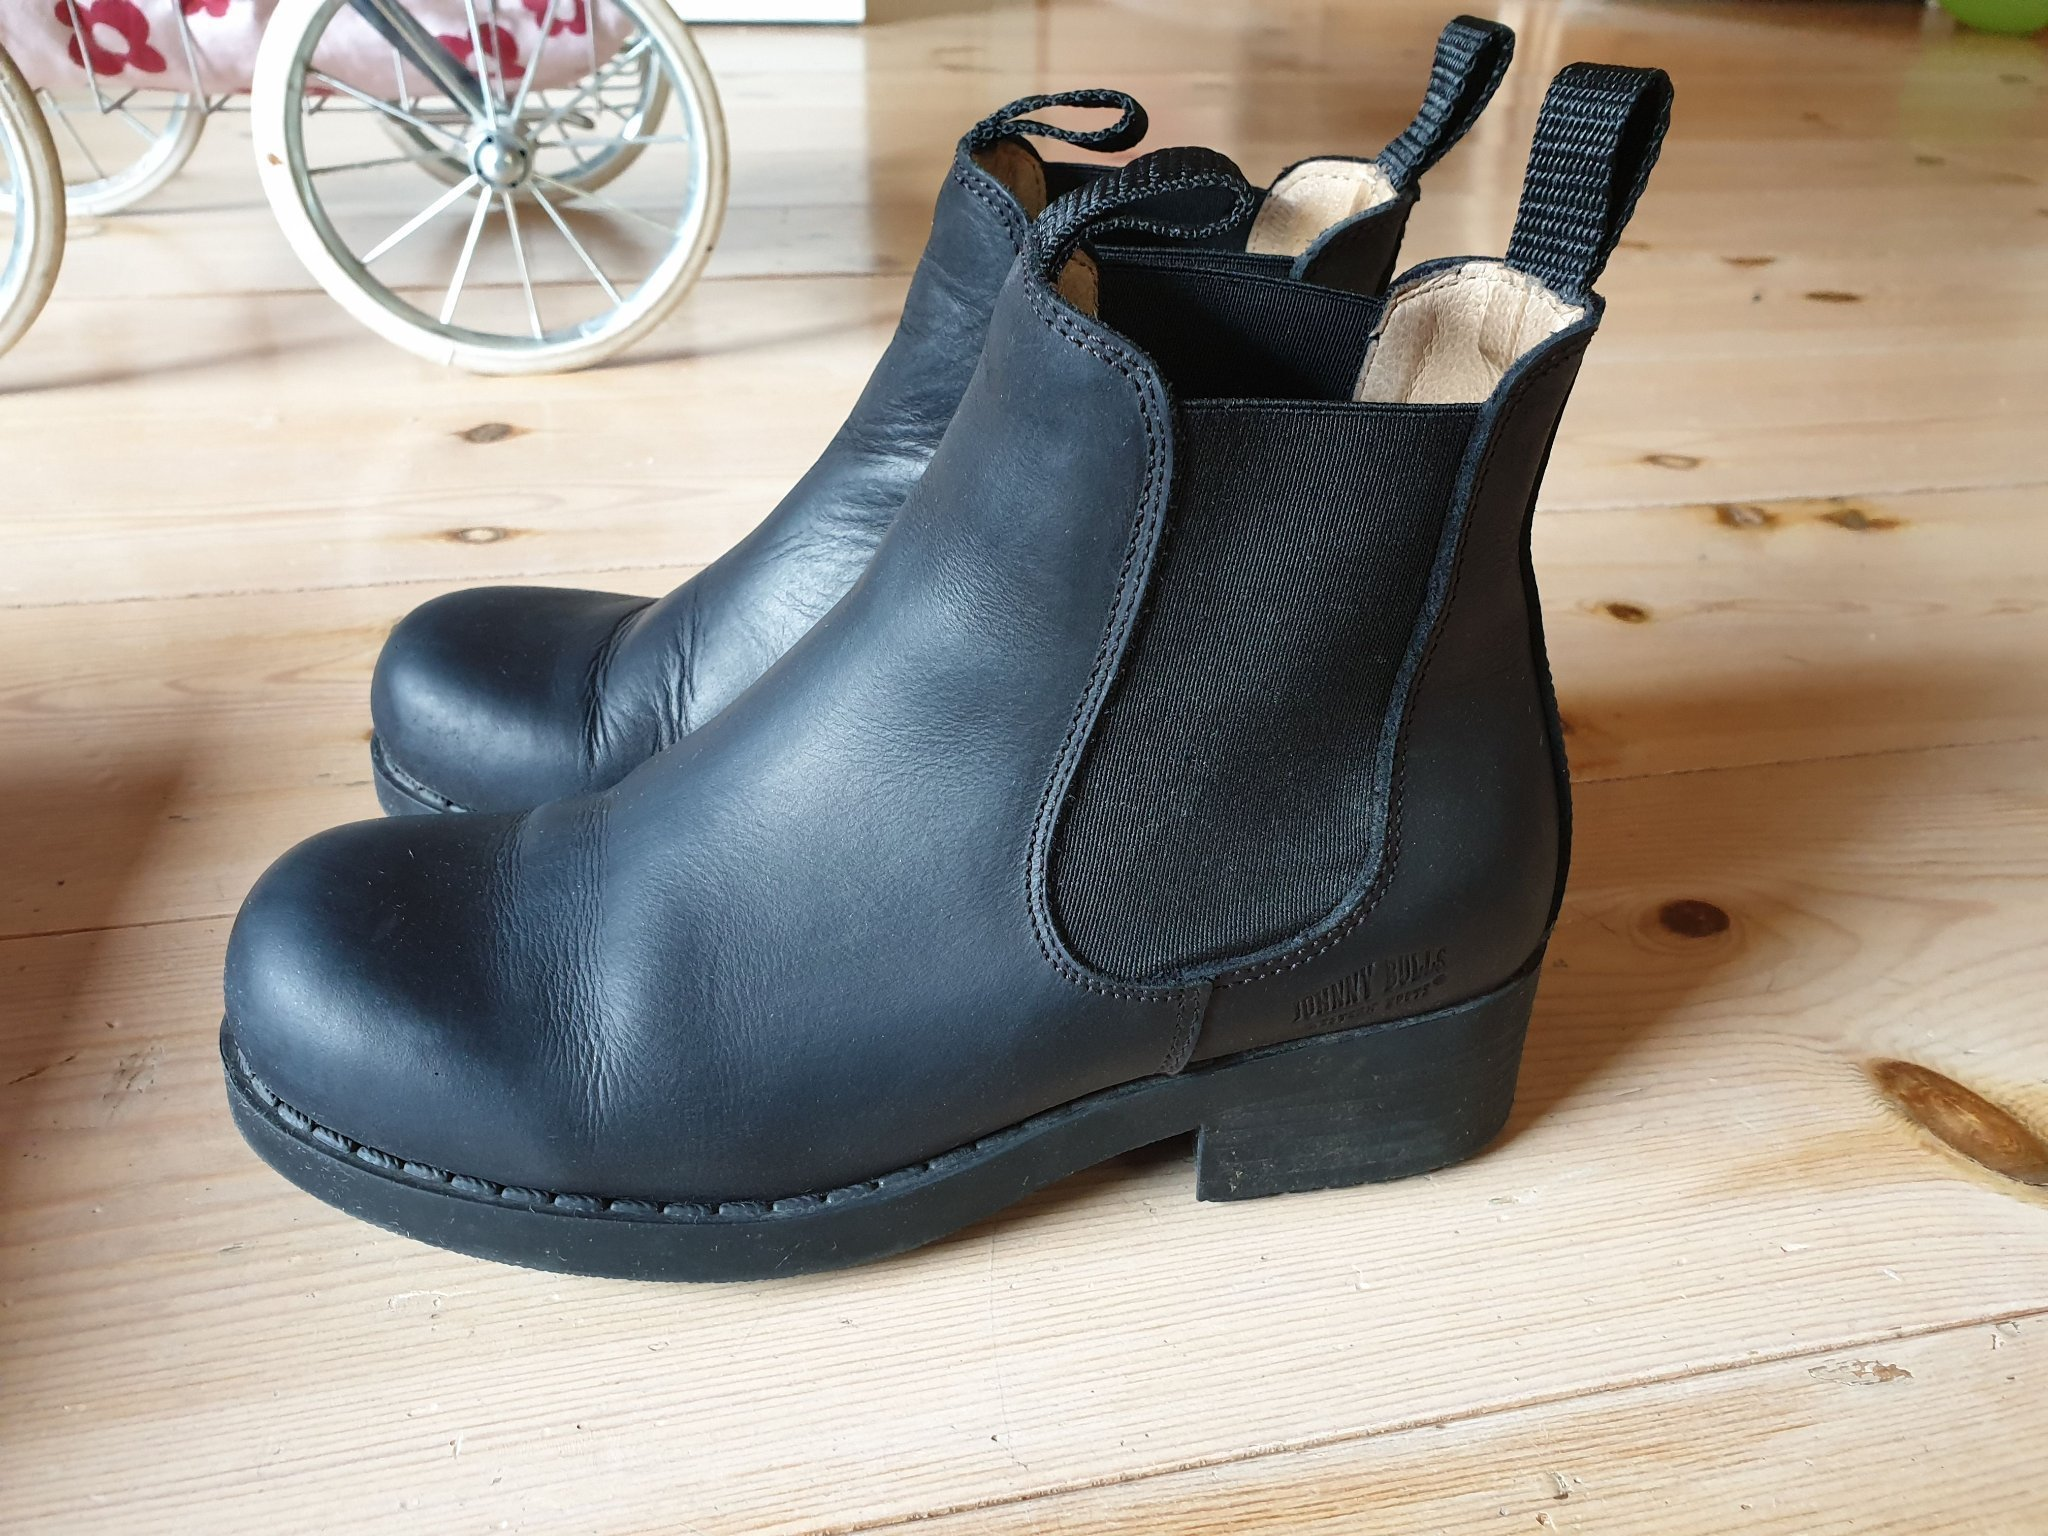 Johnny bulls western boots st 36 37